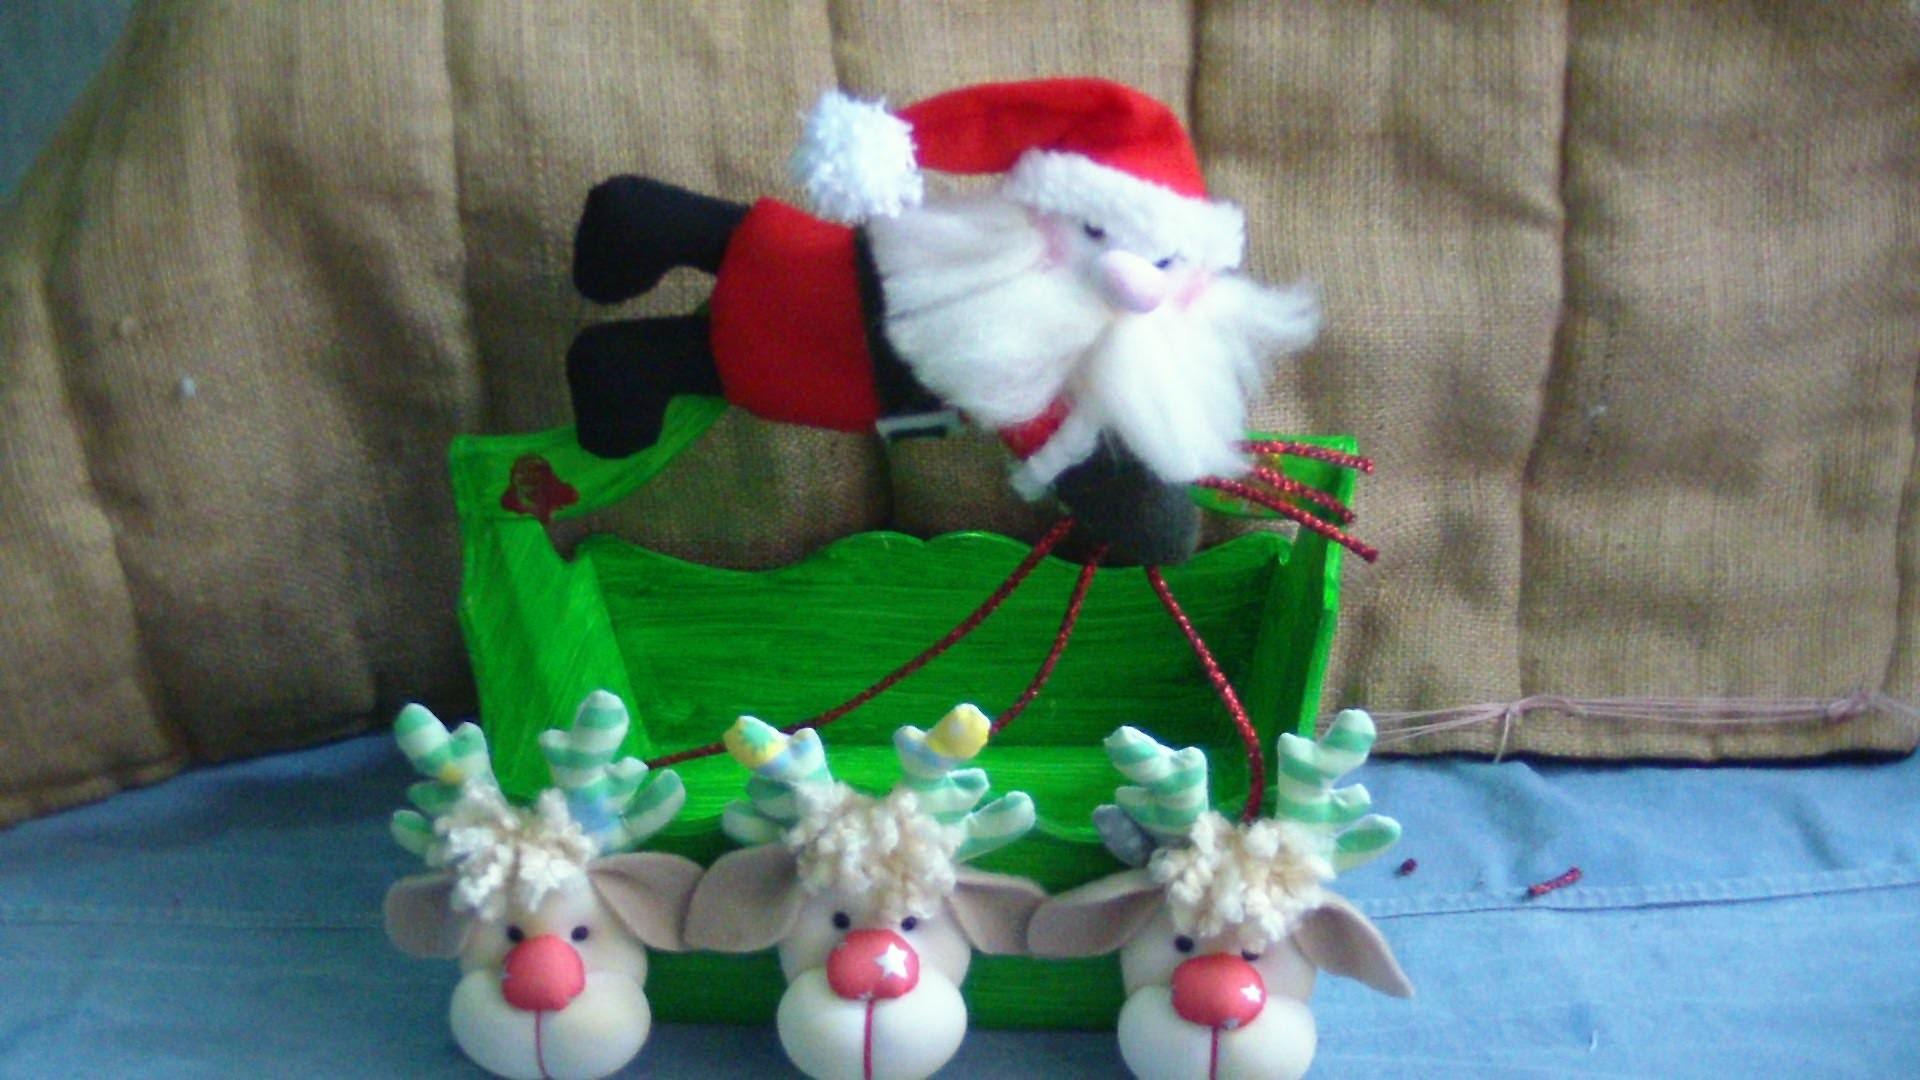 Christmas ornament subtitle.caja navideña subs 1.2. proyecto 69